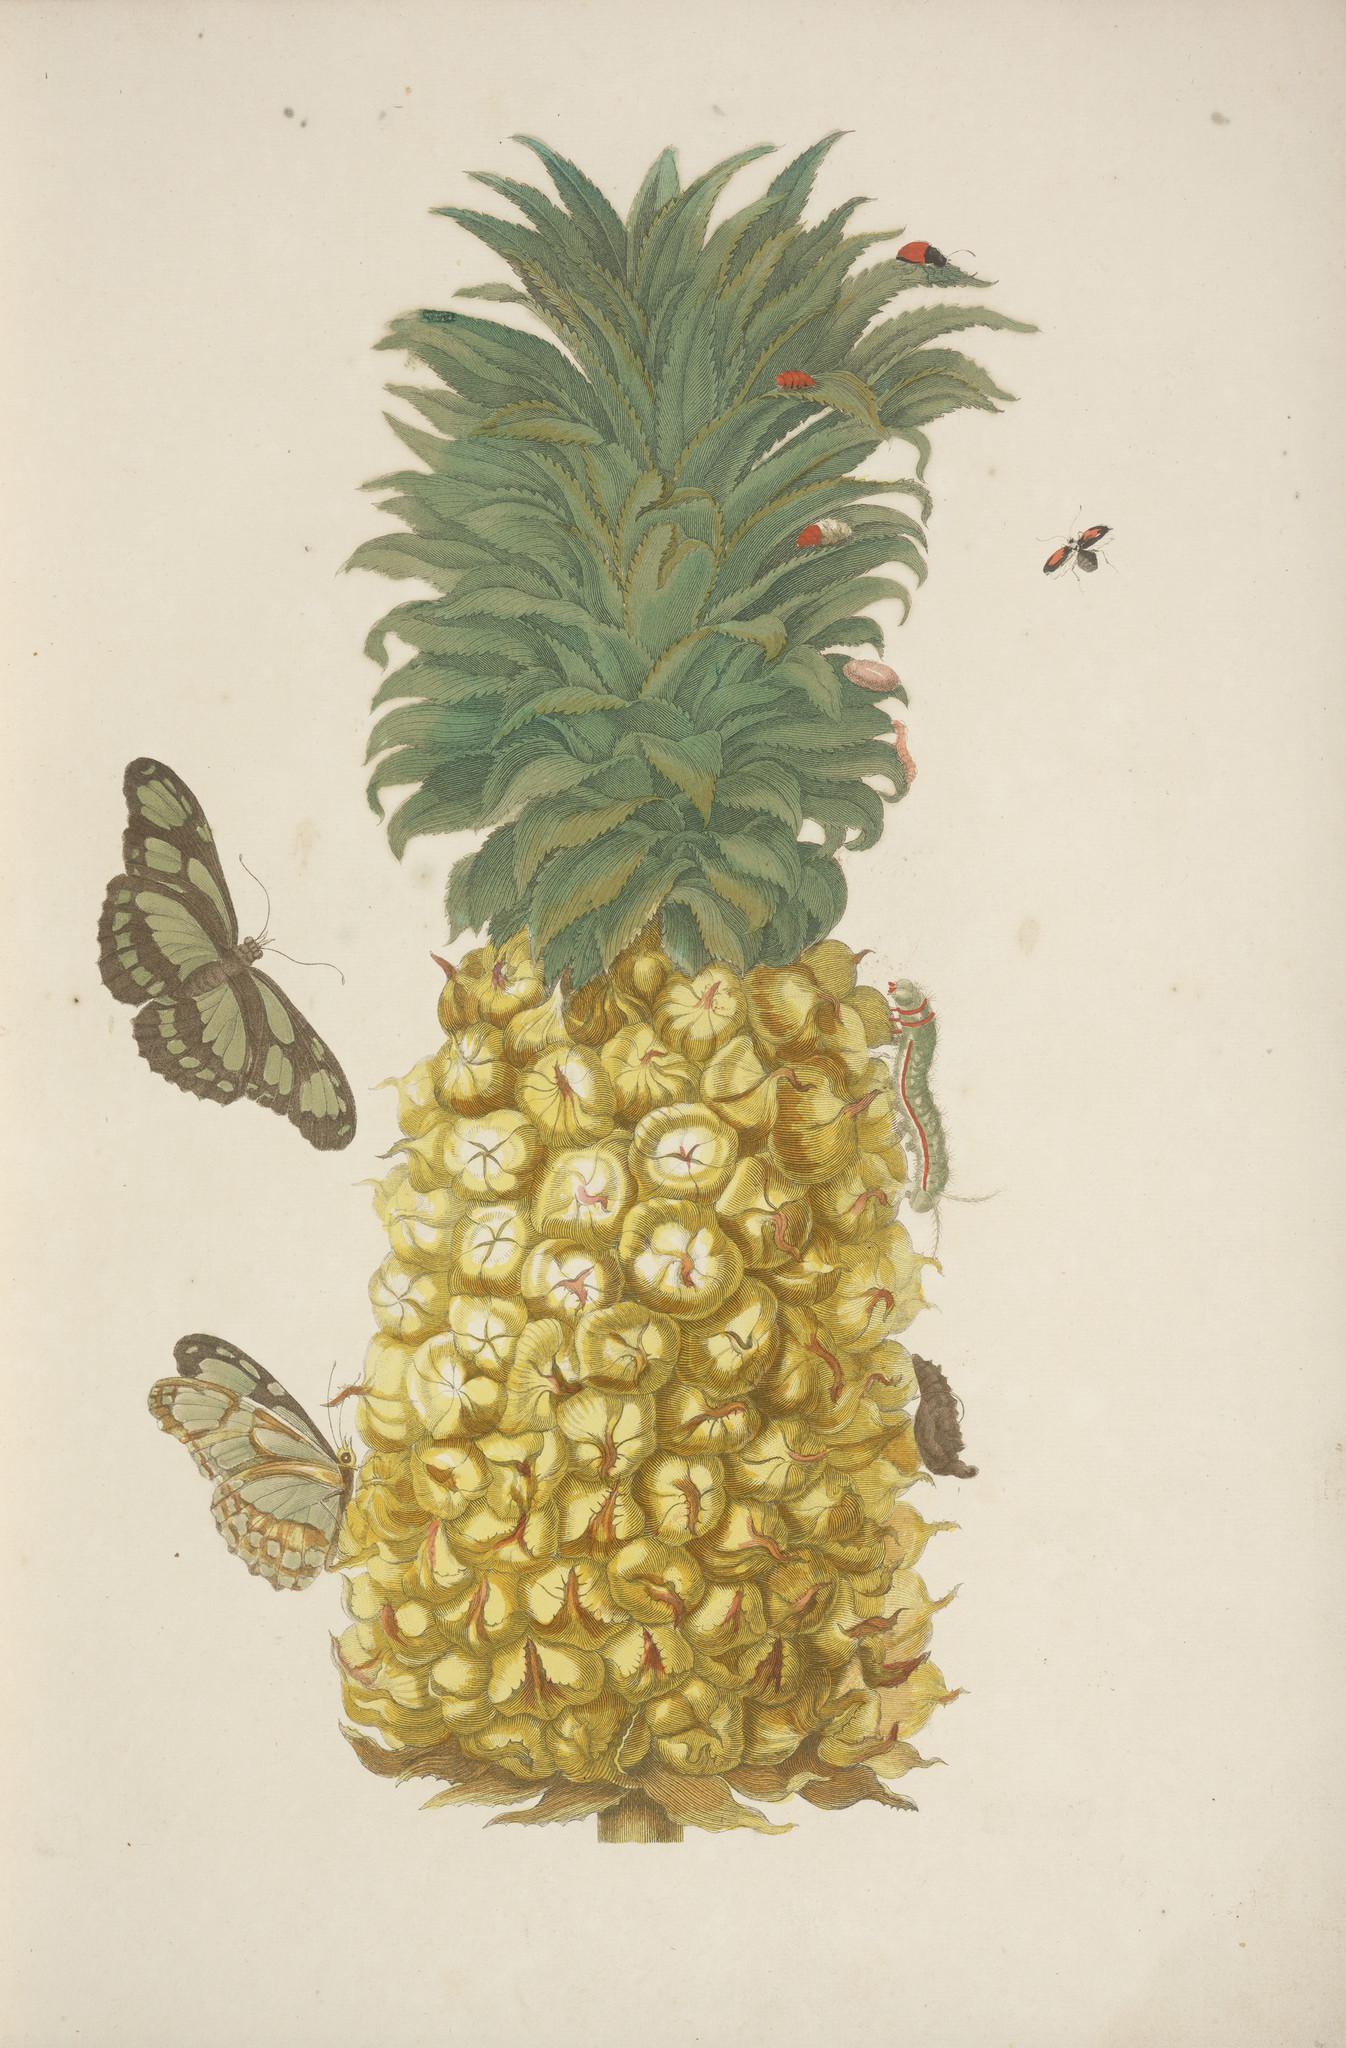 Maria Sibylla Merian pineapple